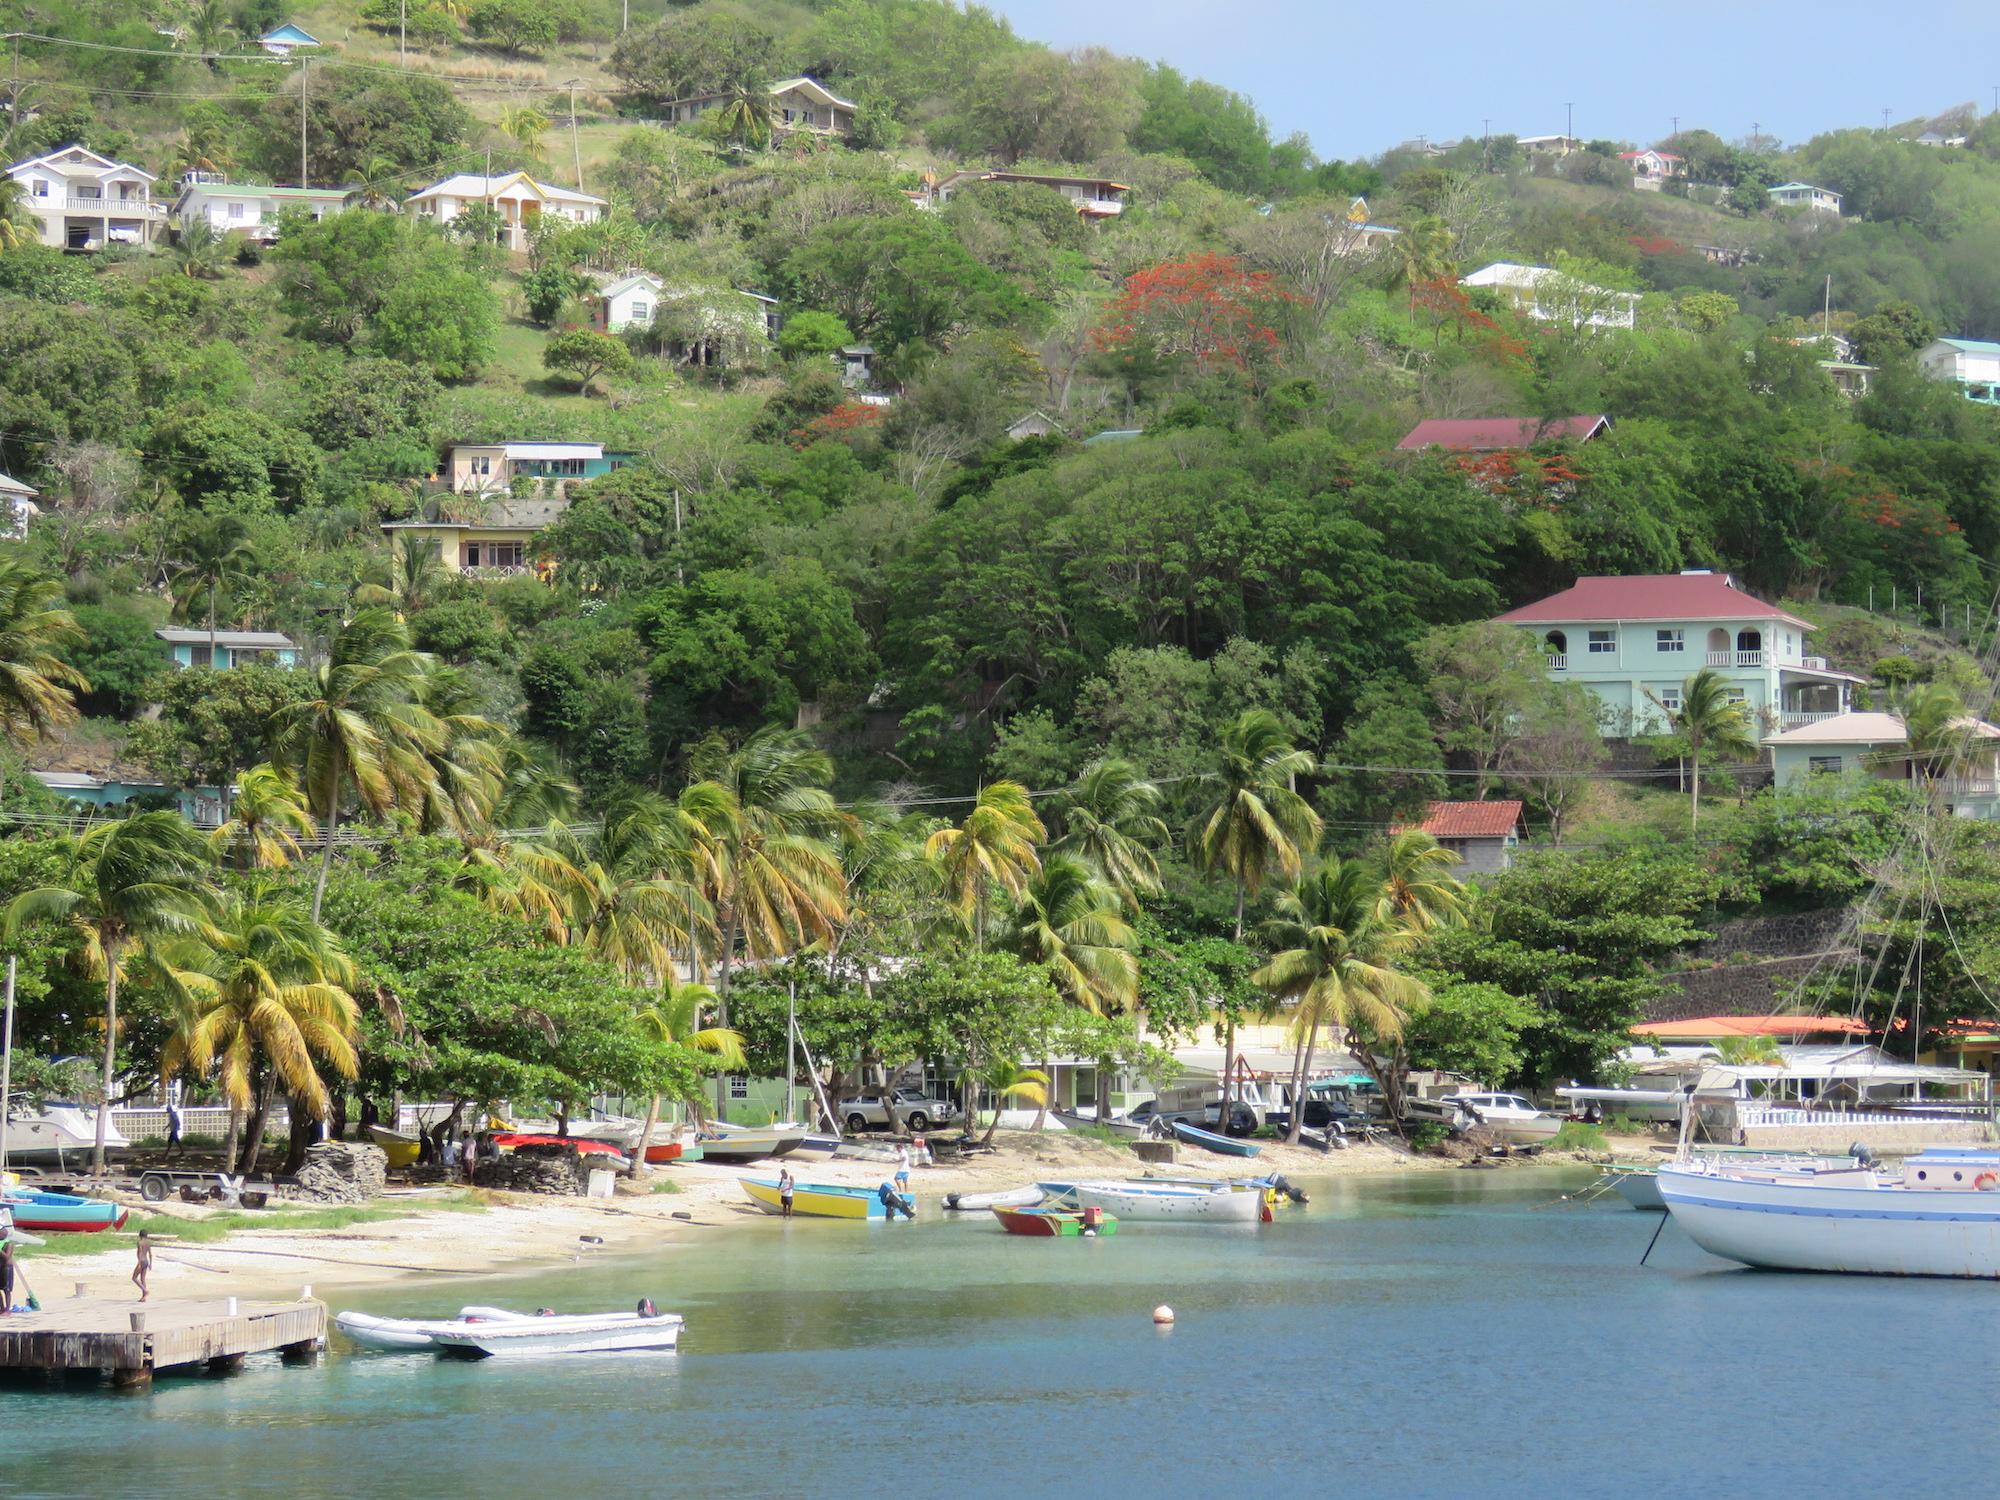 Admiralty Harbor, Bequia Island